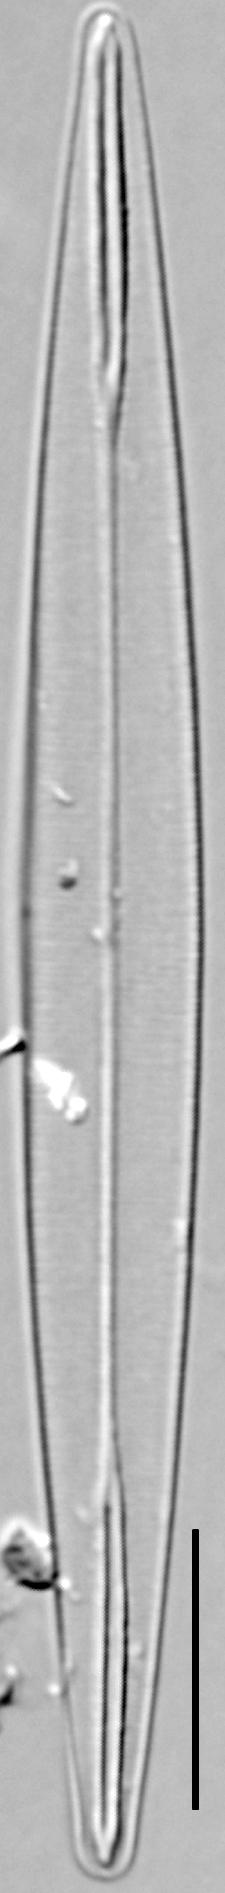 Amphipleura pellucida LM4